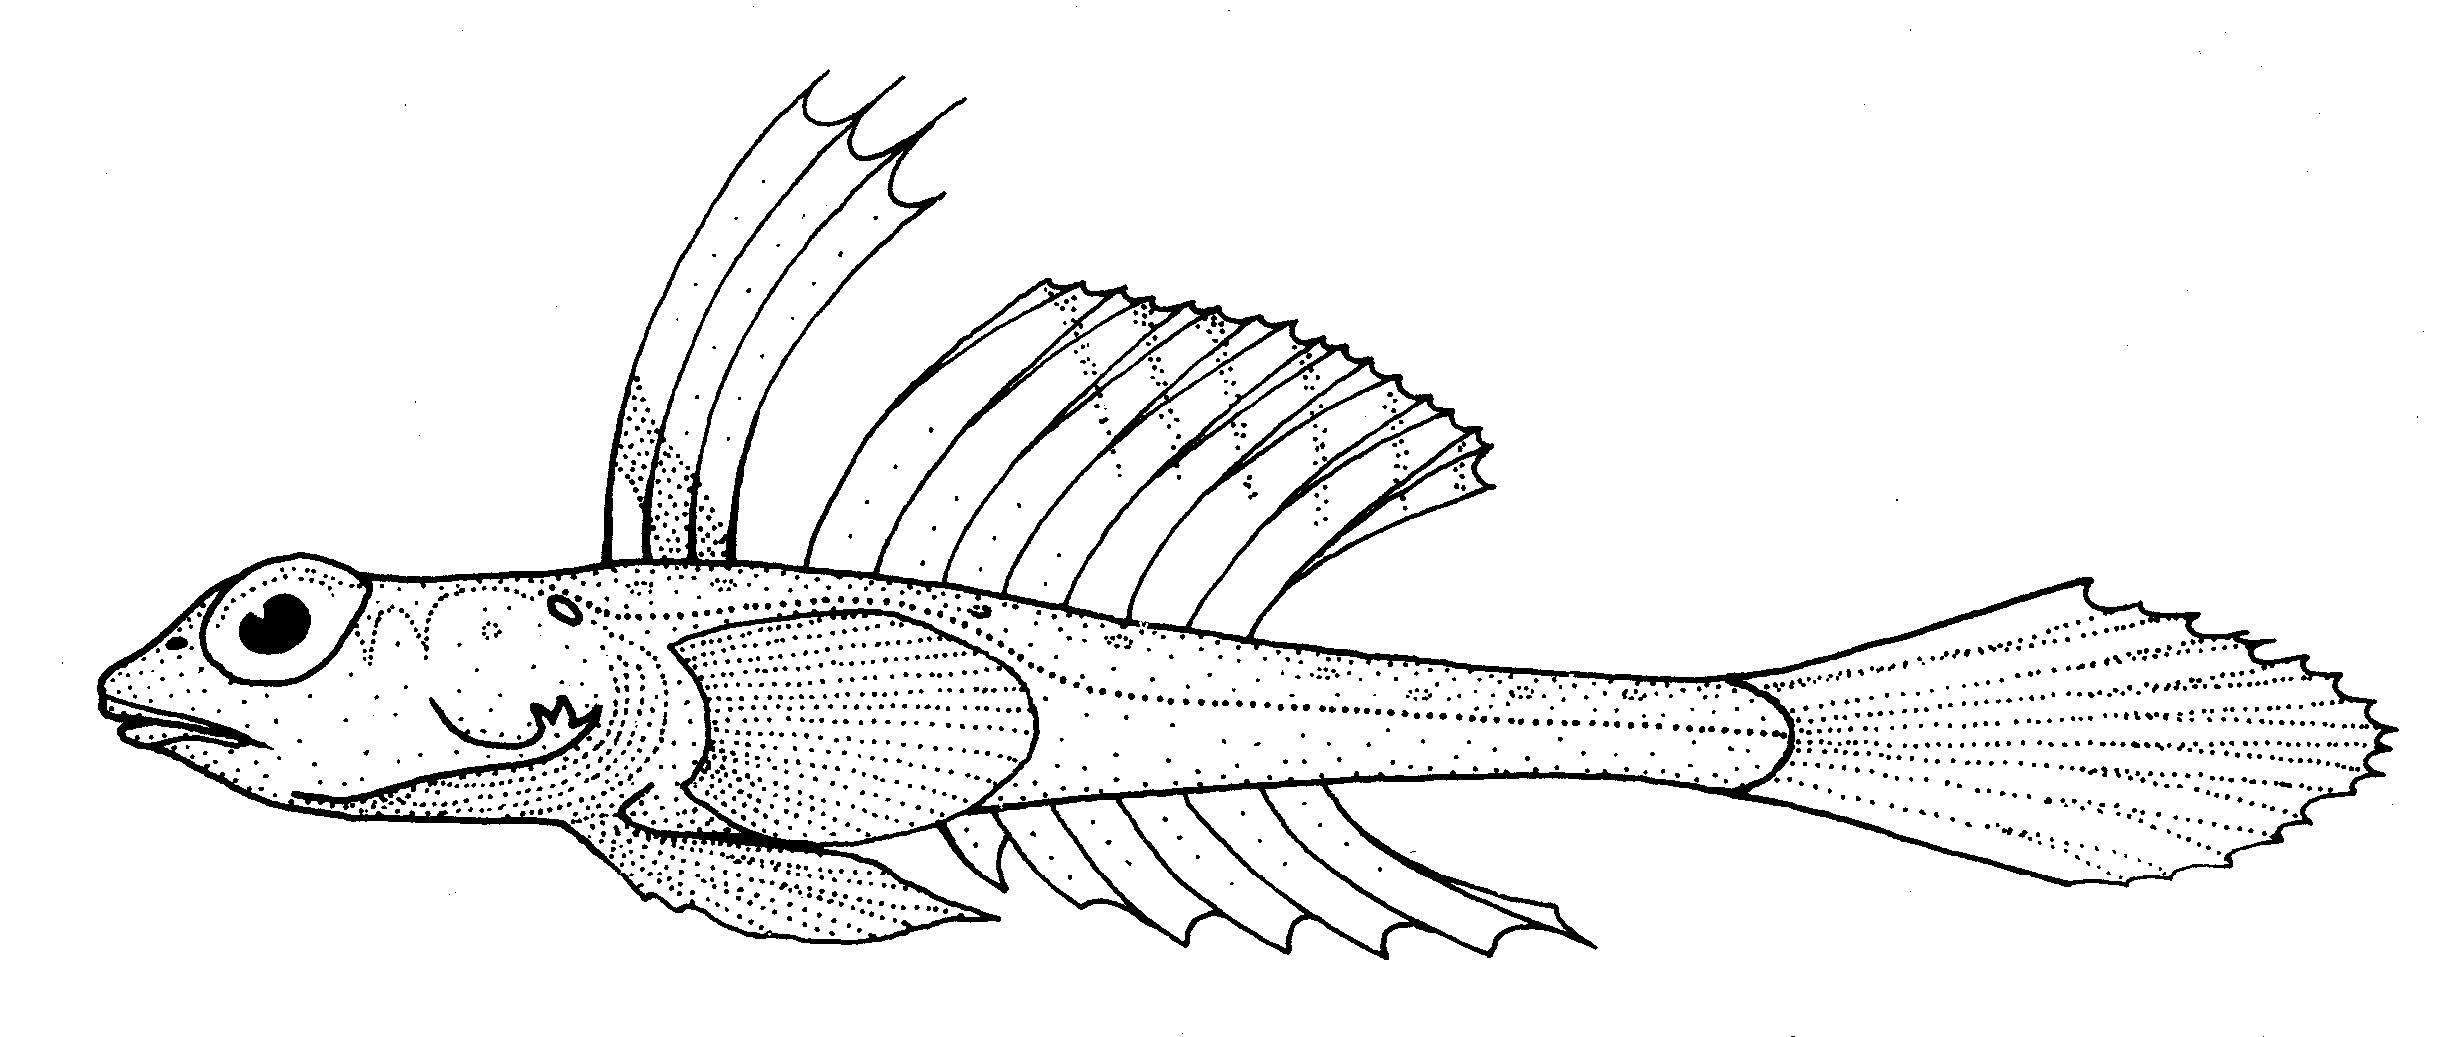 Image of Bight stinkfish